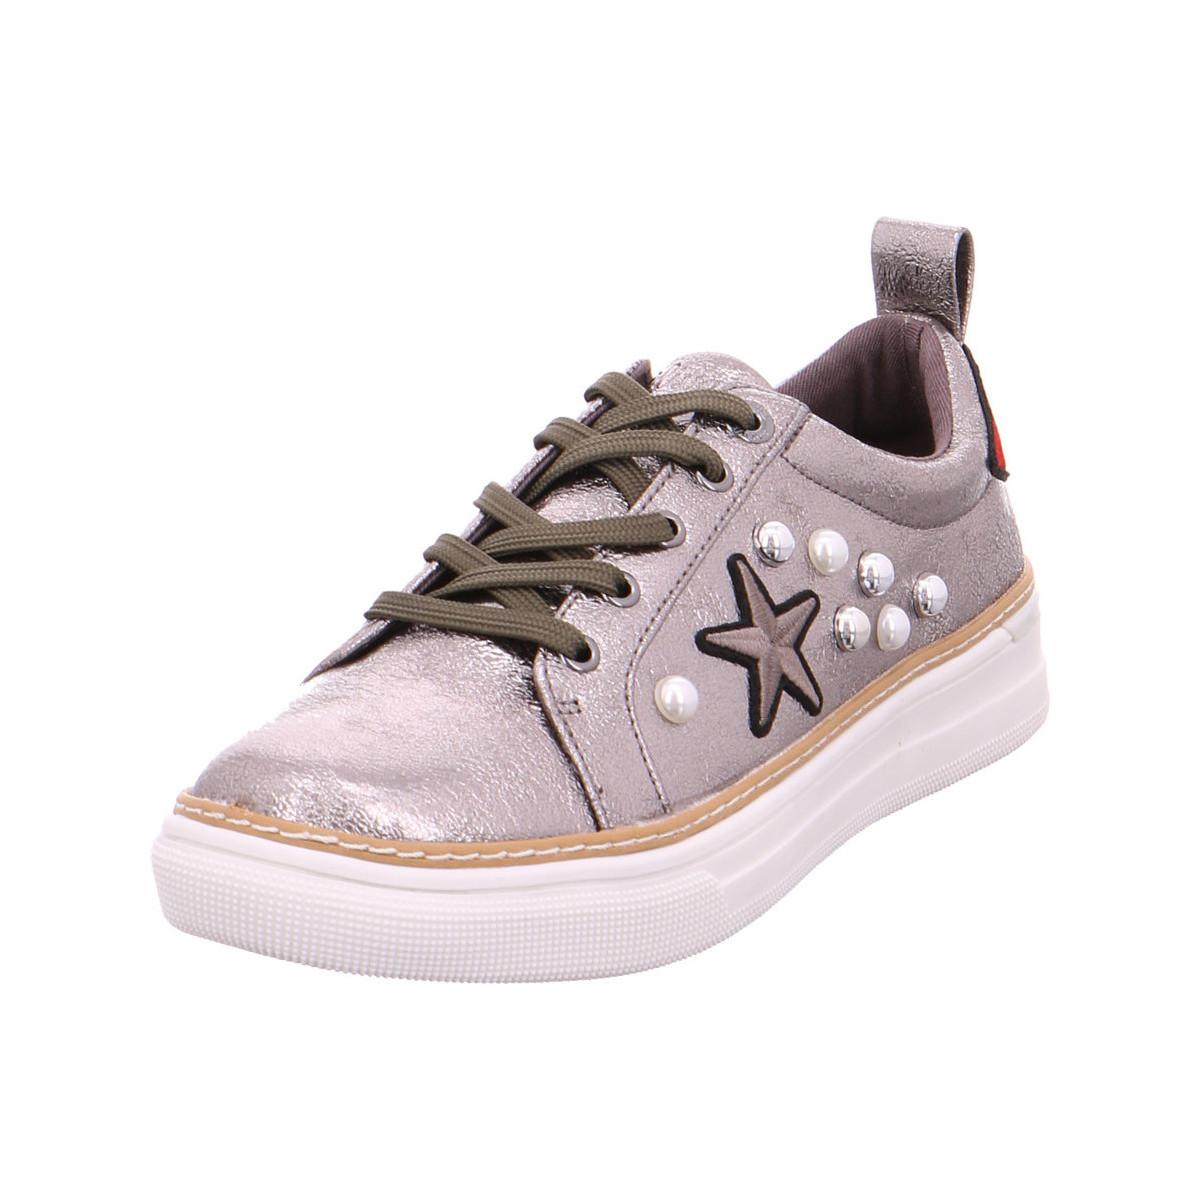 SOliver Da-Schnürer PEWTER 915 - Schuhe Sneaker Low Damen 47,95 €